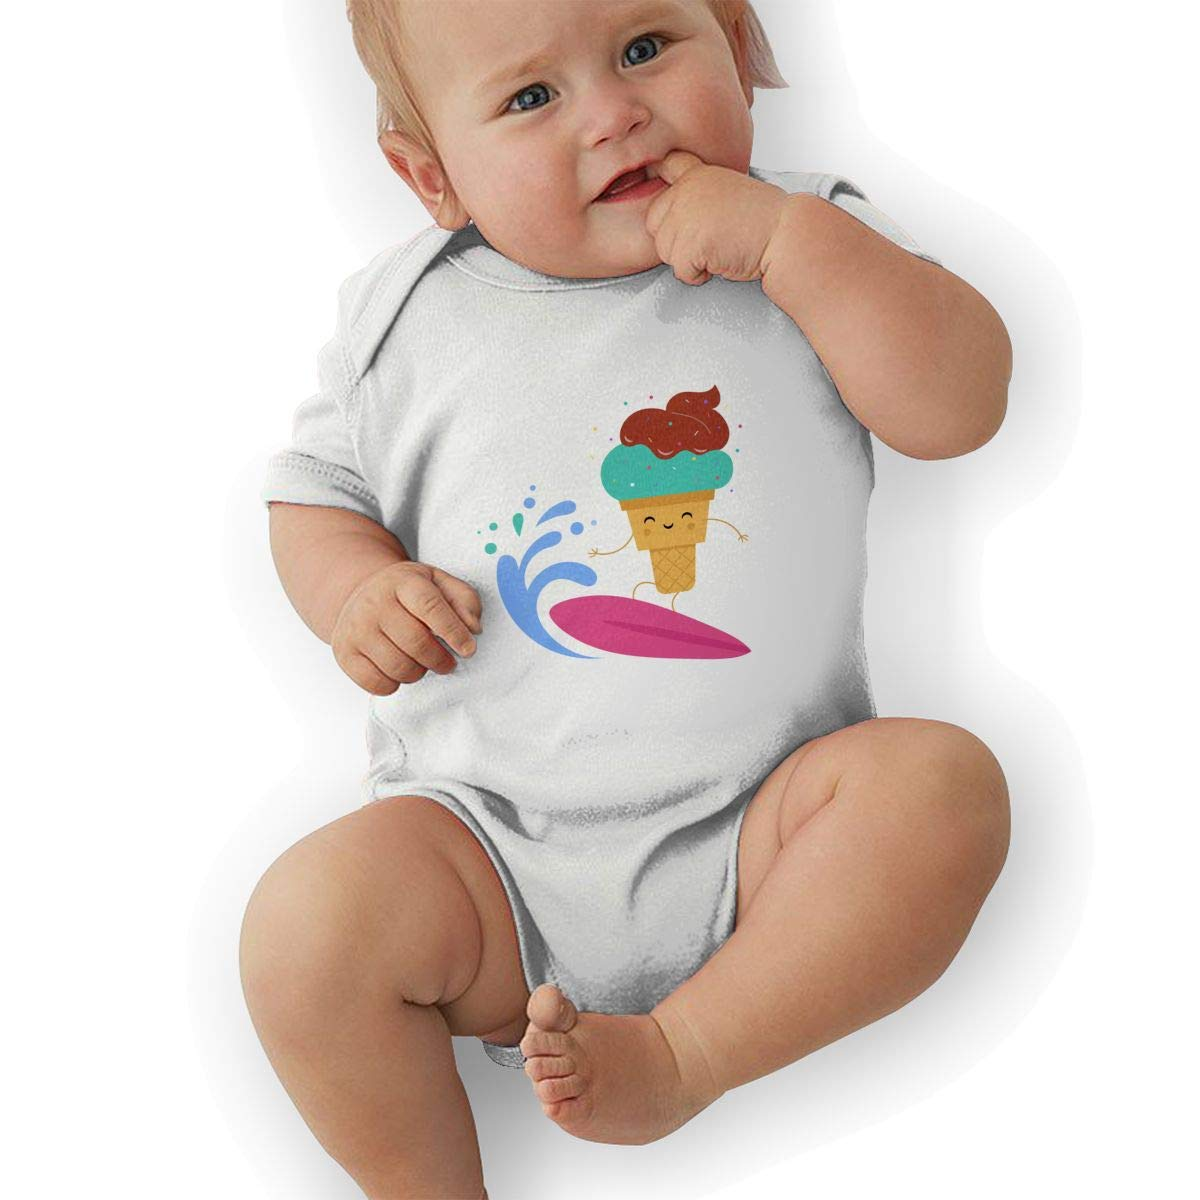 Newborn Baby Boys Bodysuit Short-Sleeve Onesie Surfing Ice Cream Print Rompers Winter Pajamas